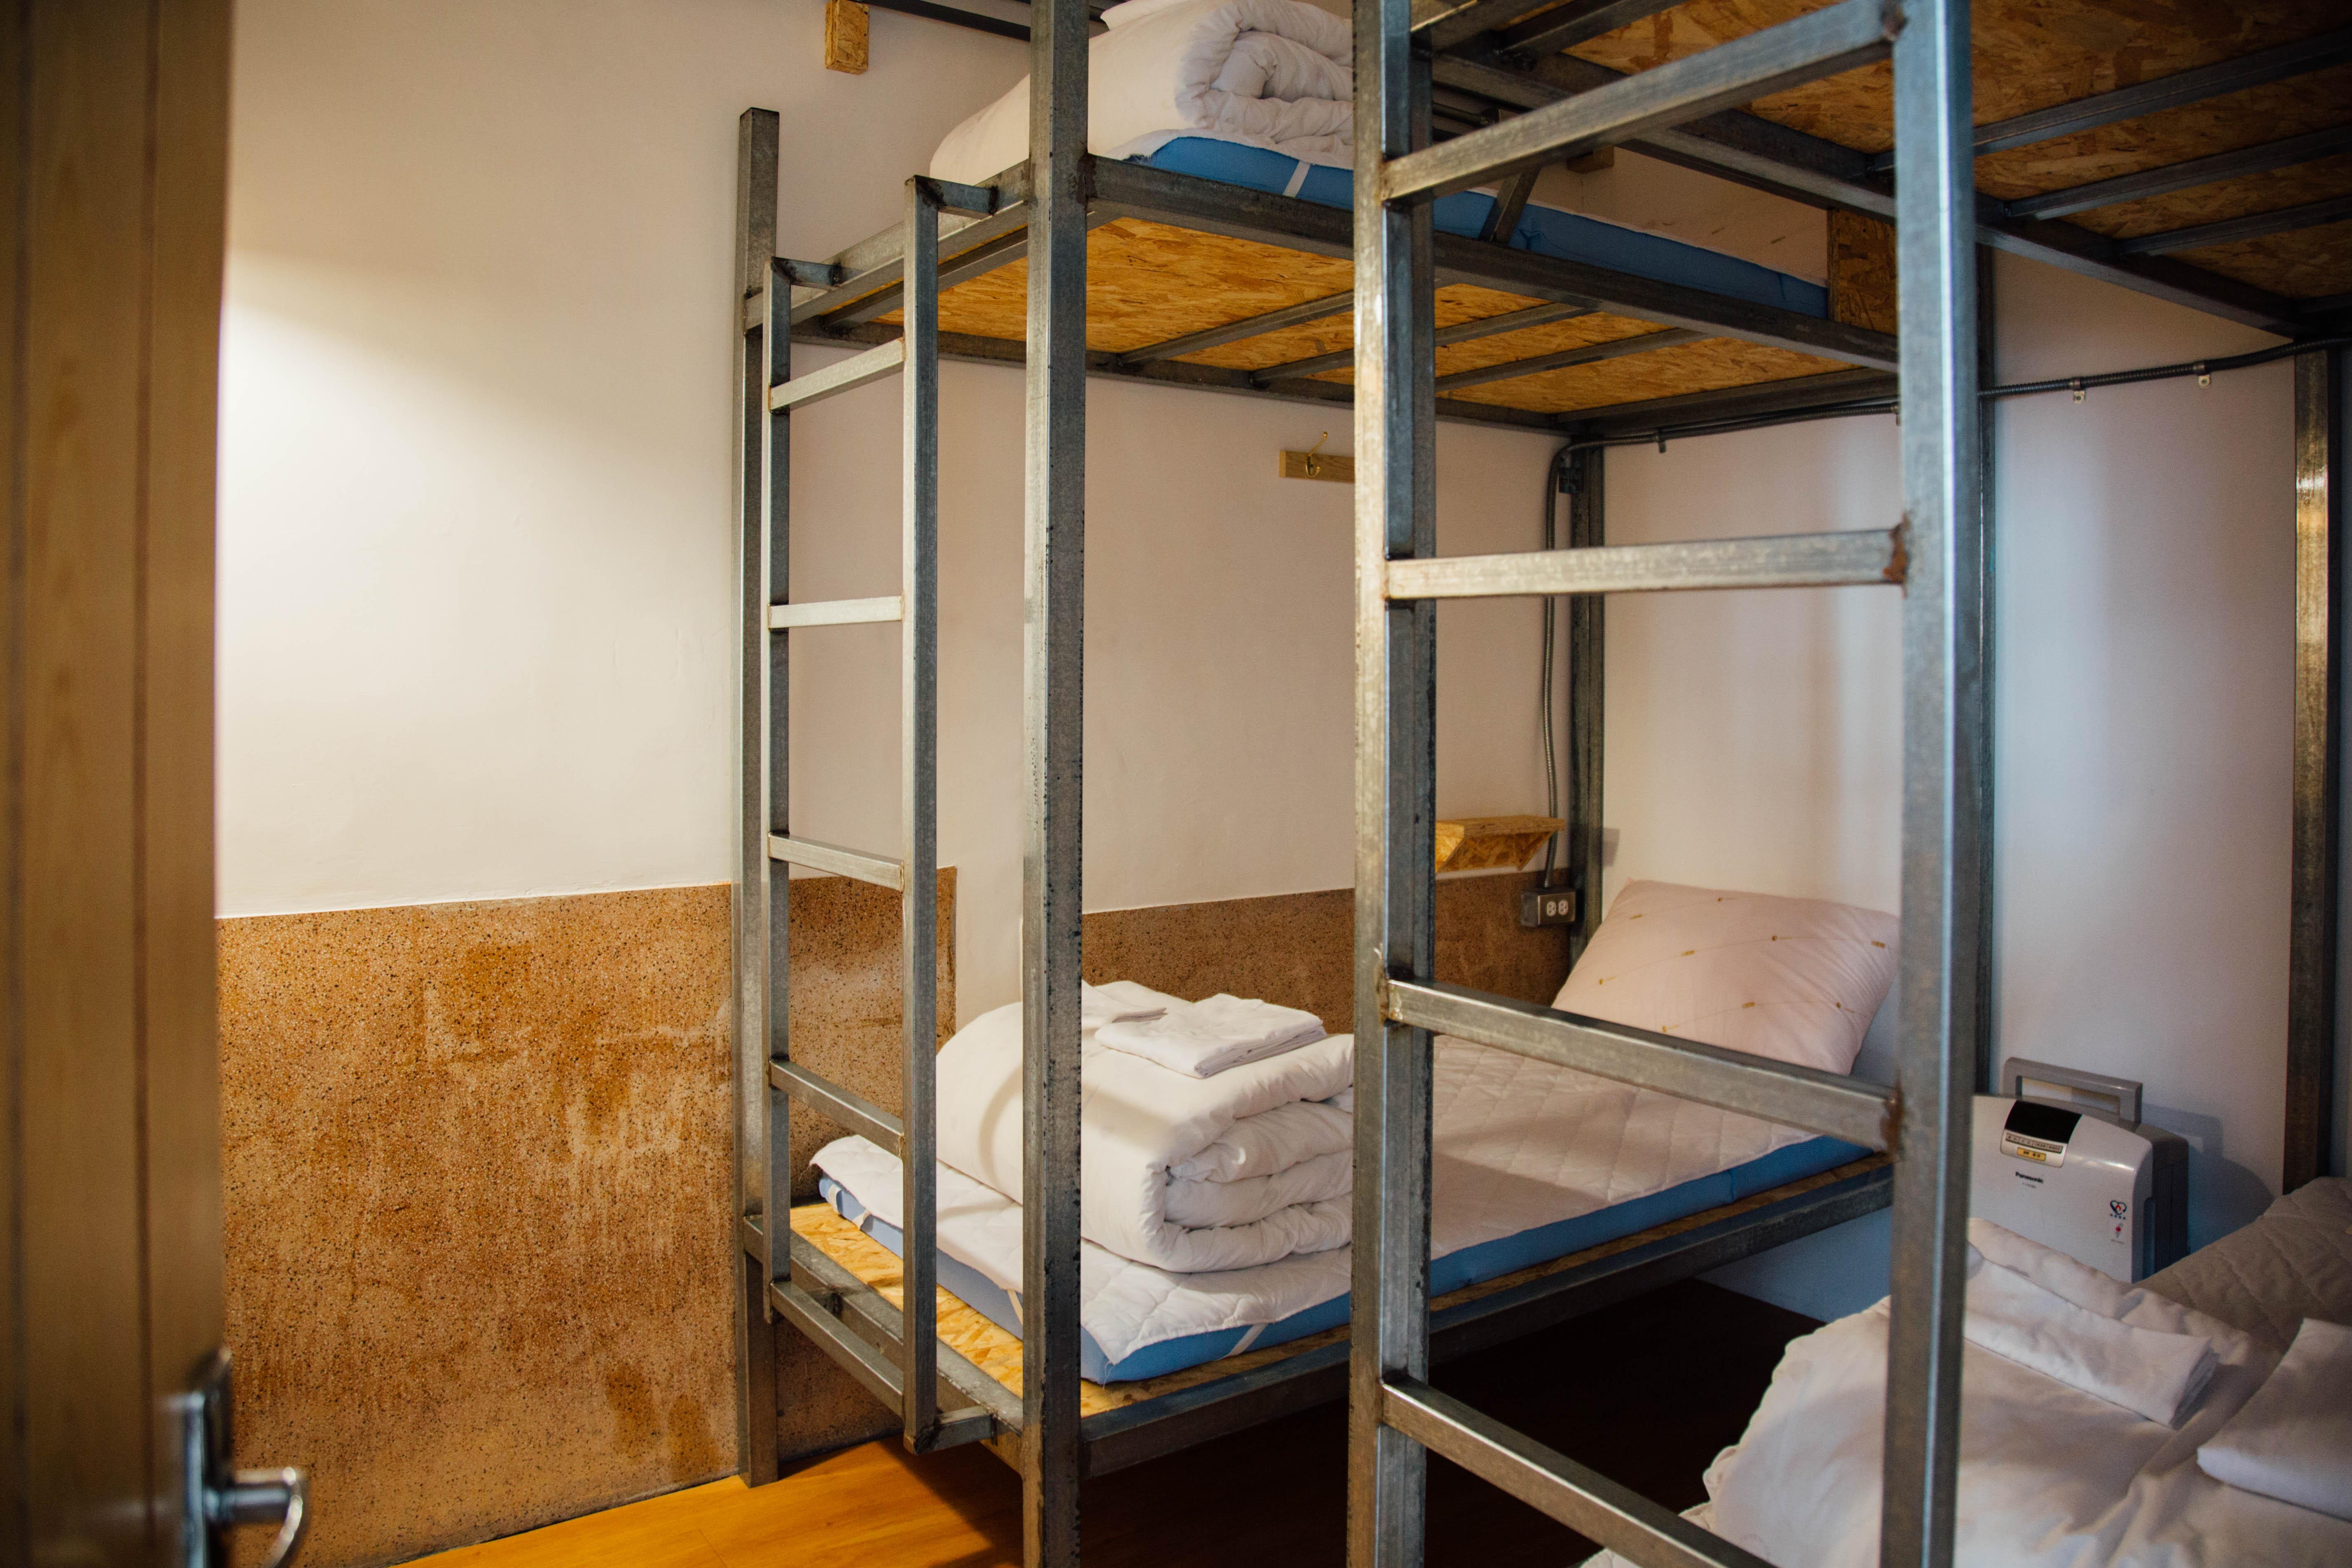 4 Female dormitory